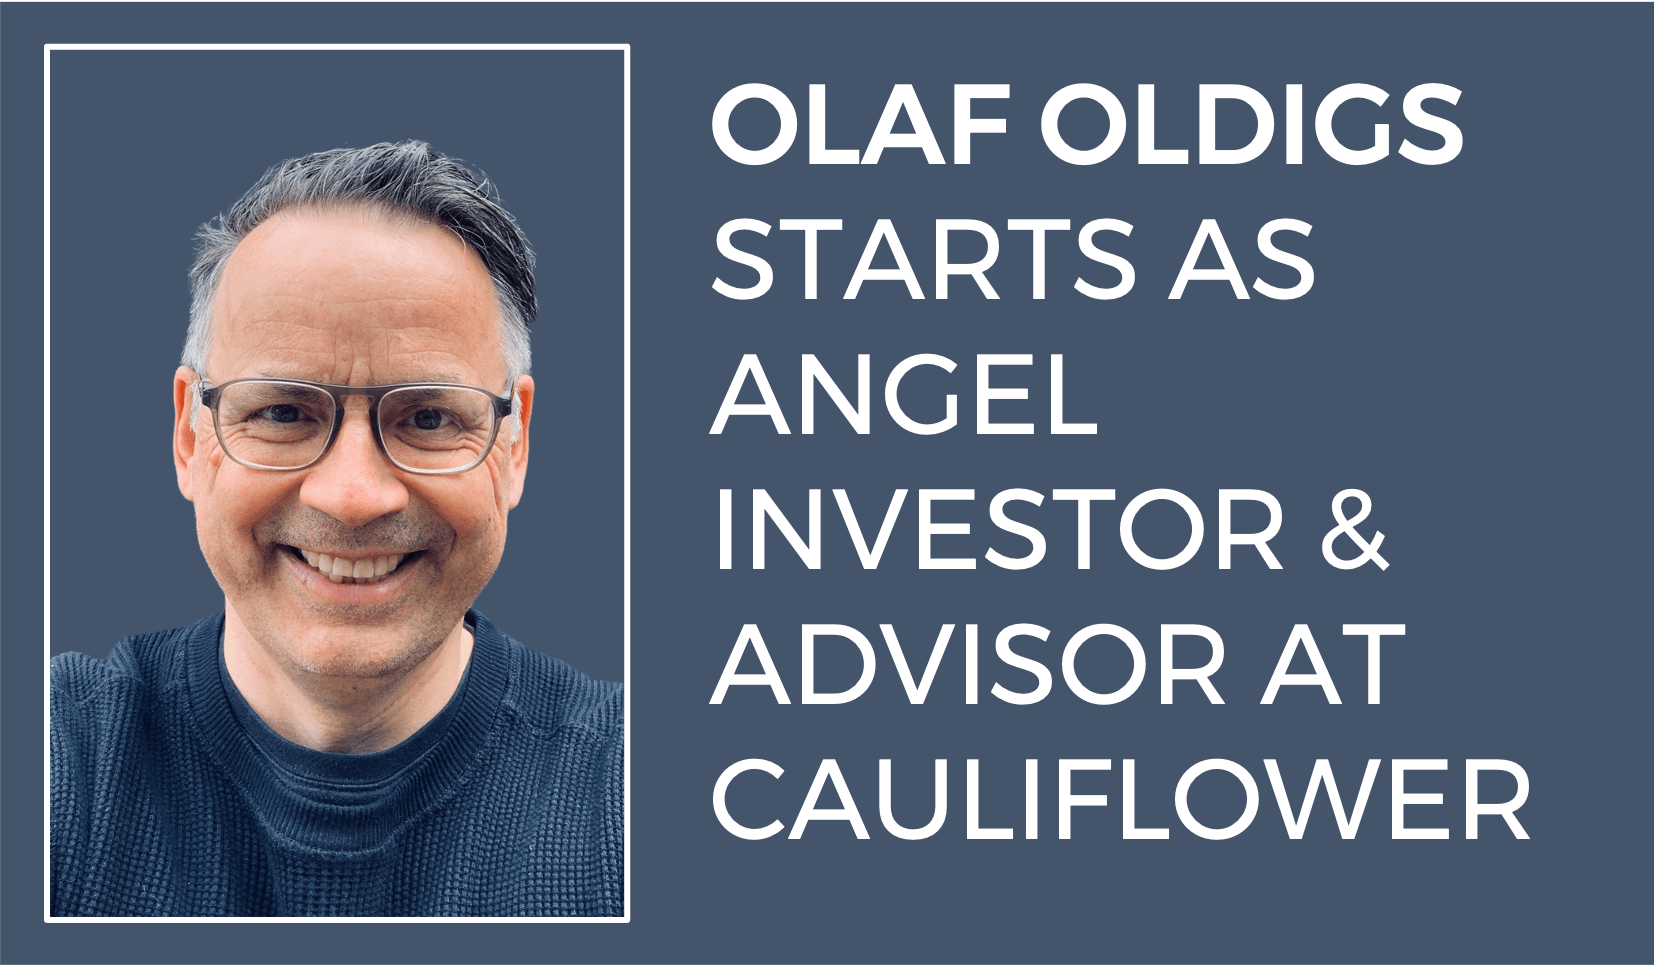 Olaf Oldigs starts as angel investor